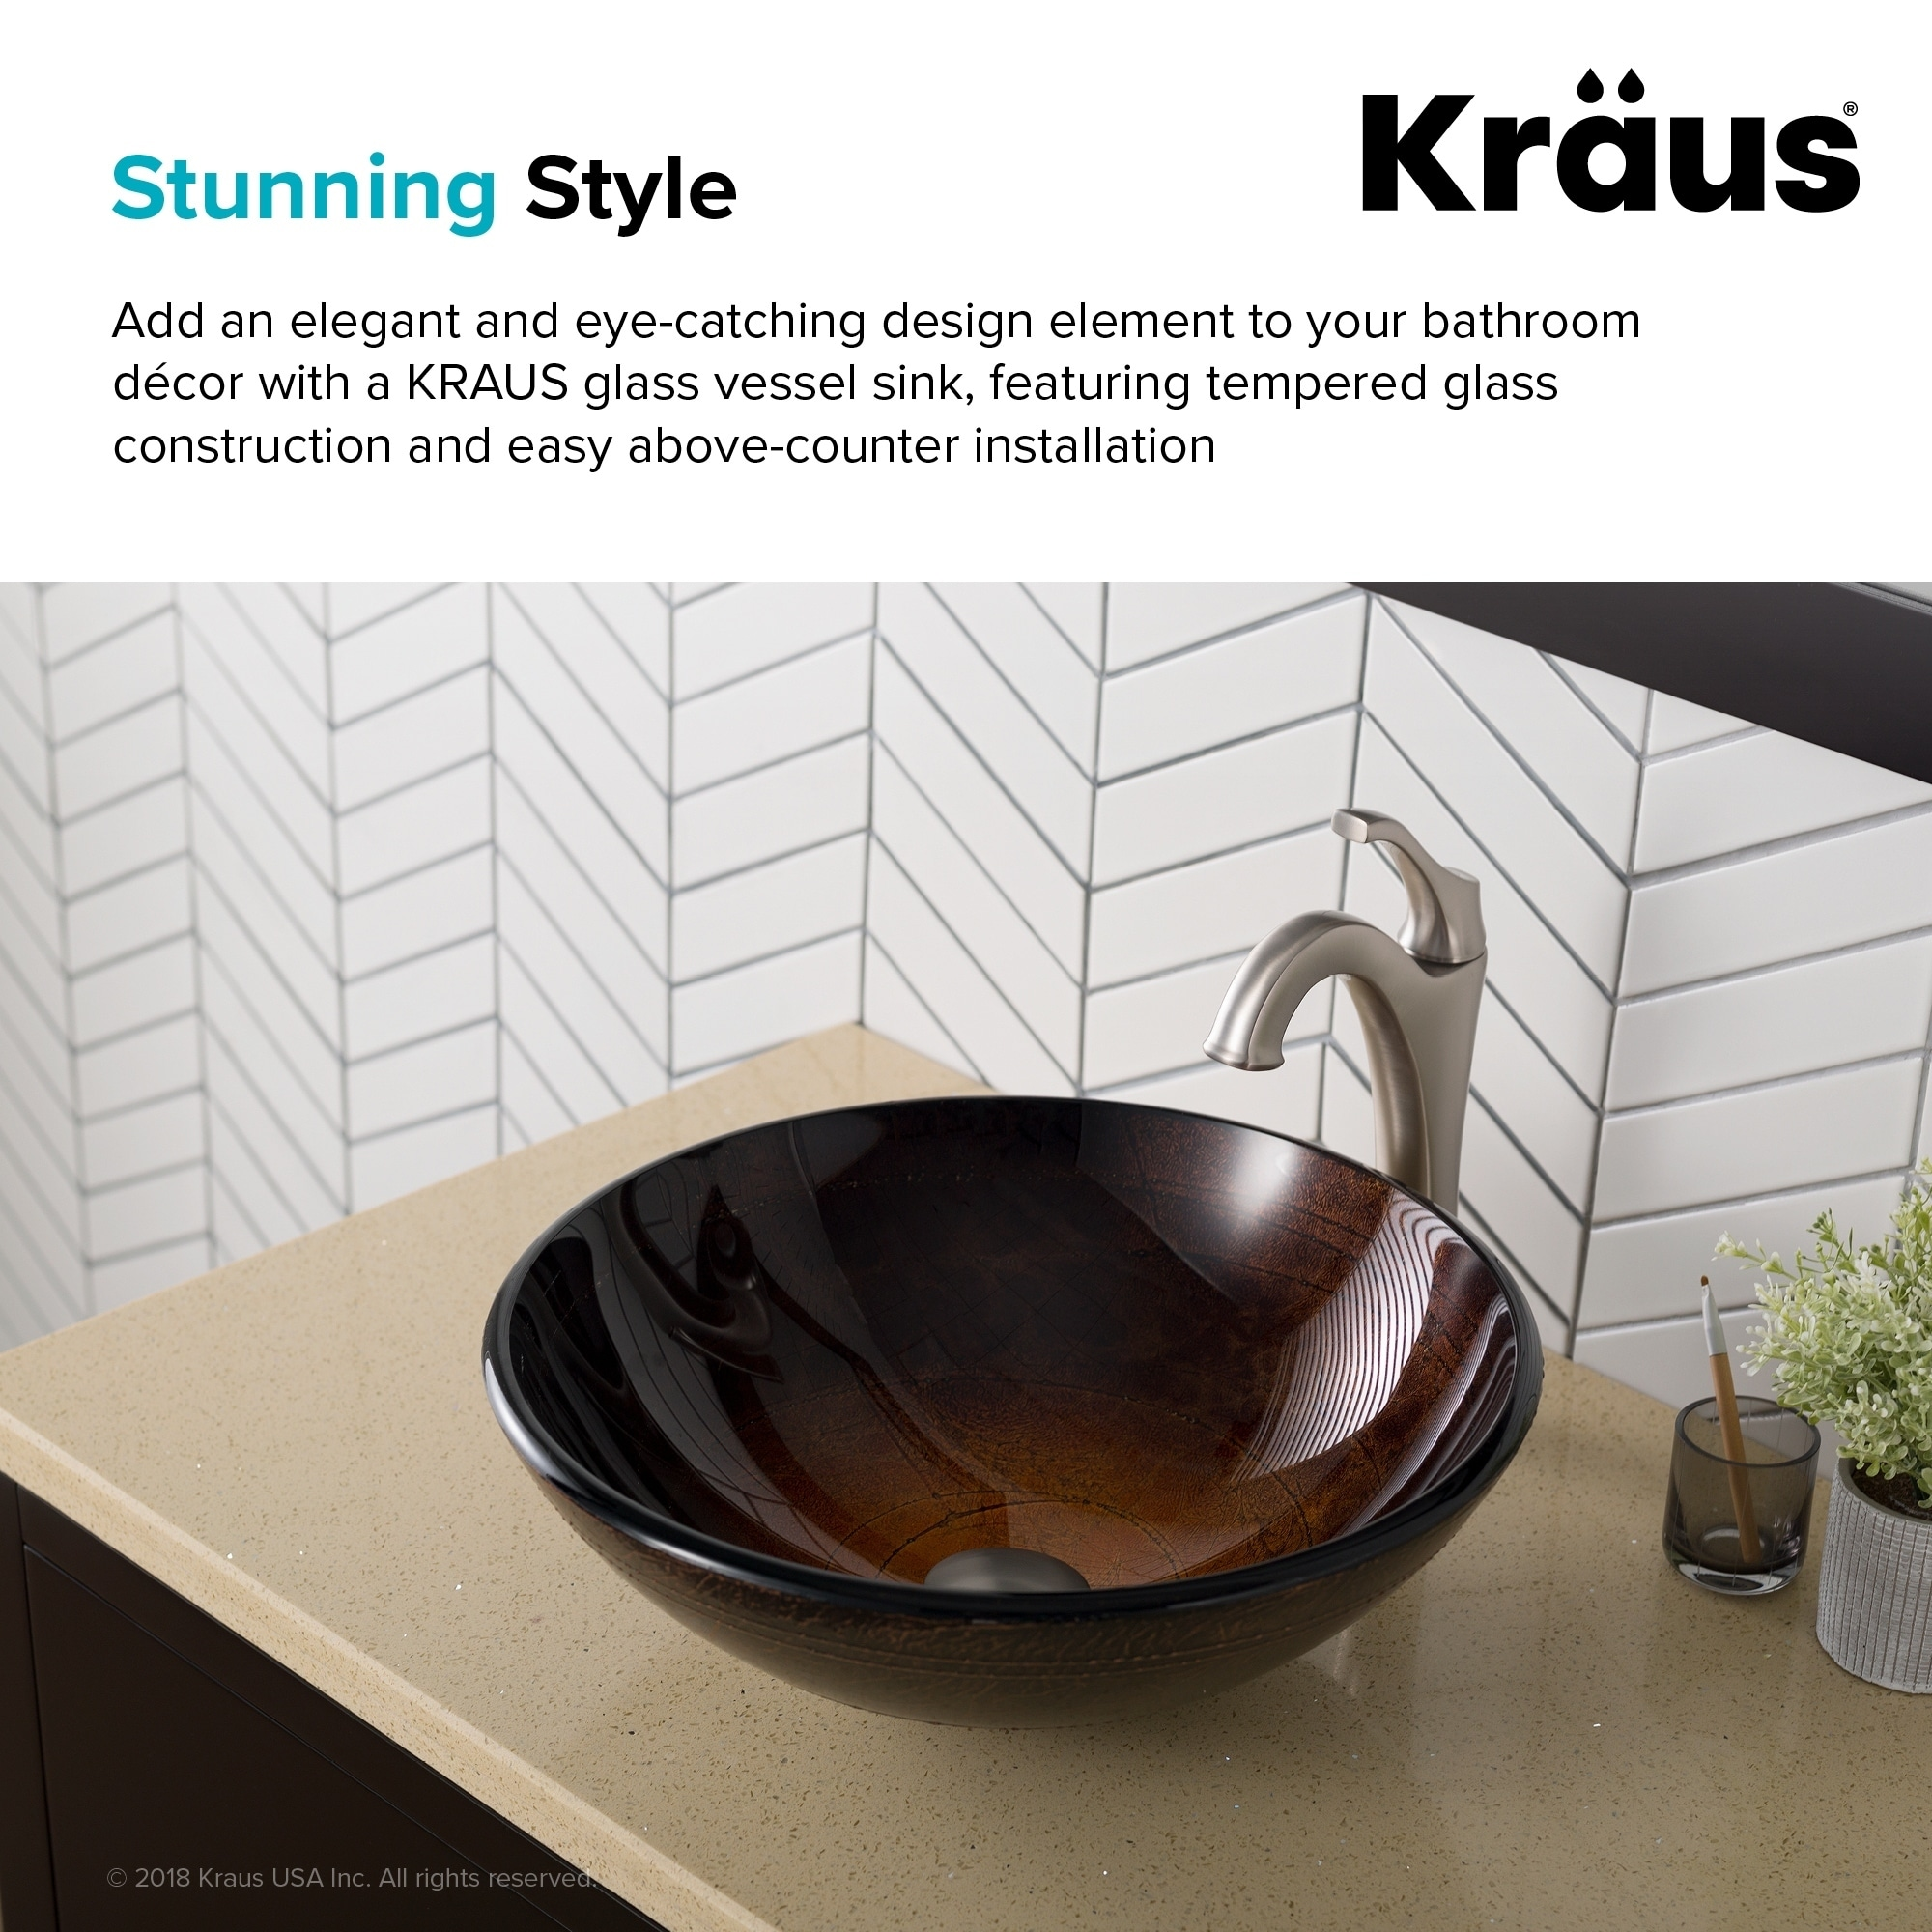 Shop Kraus Gv 580 Copper Illusion 16 1 2 Inch Round Glass Vessel